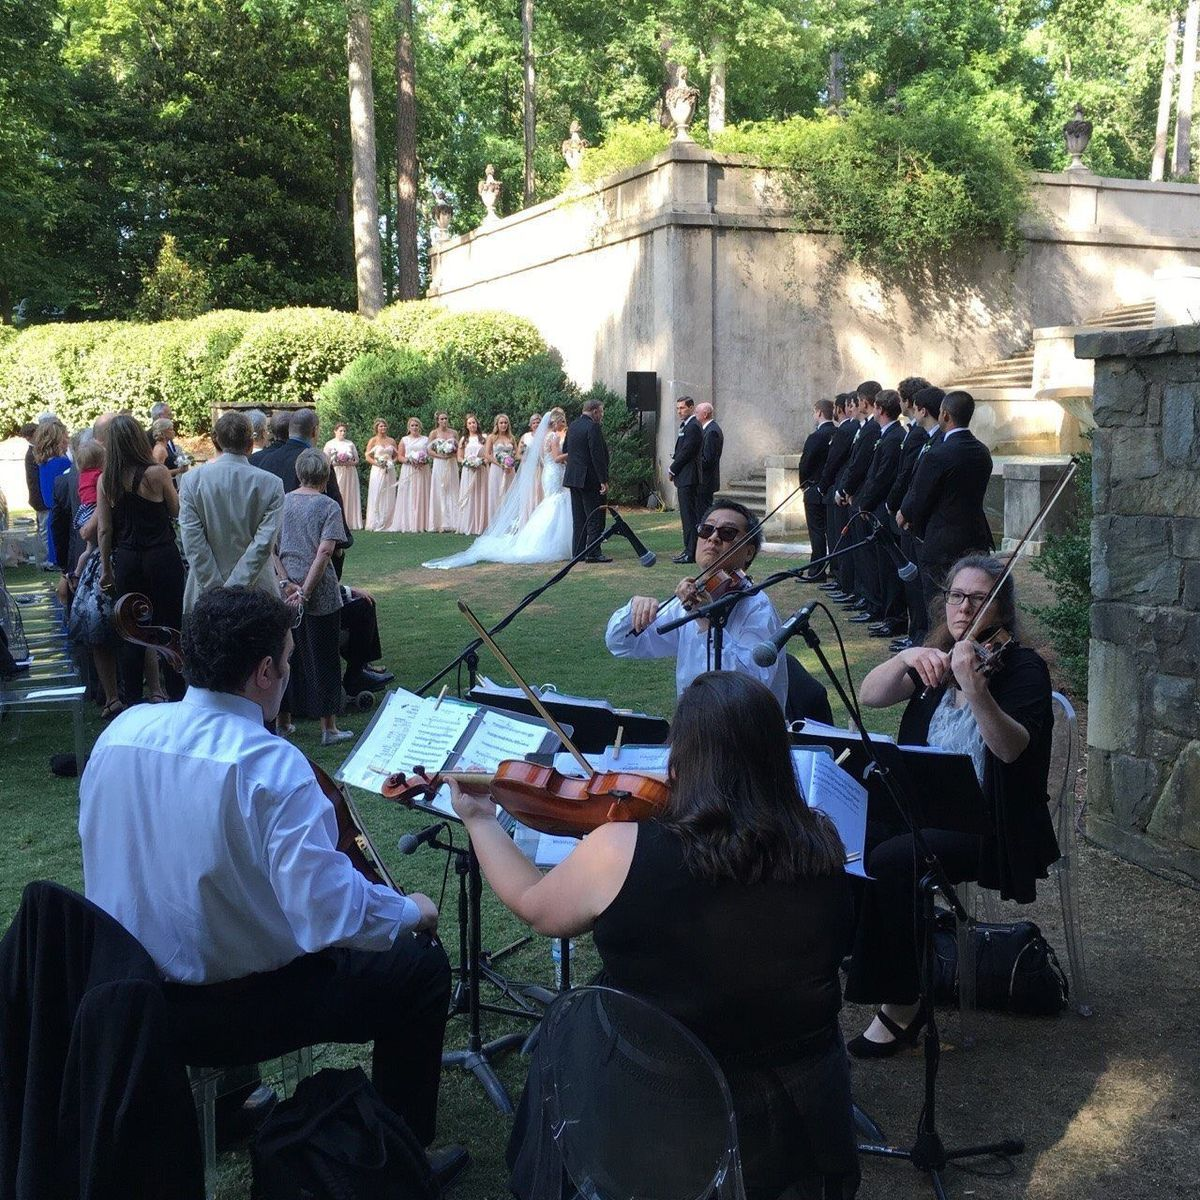 String Quartet Wedding Songs Ideas: After Five String Quartet, Wedding Ceremony Music, Georgia